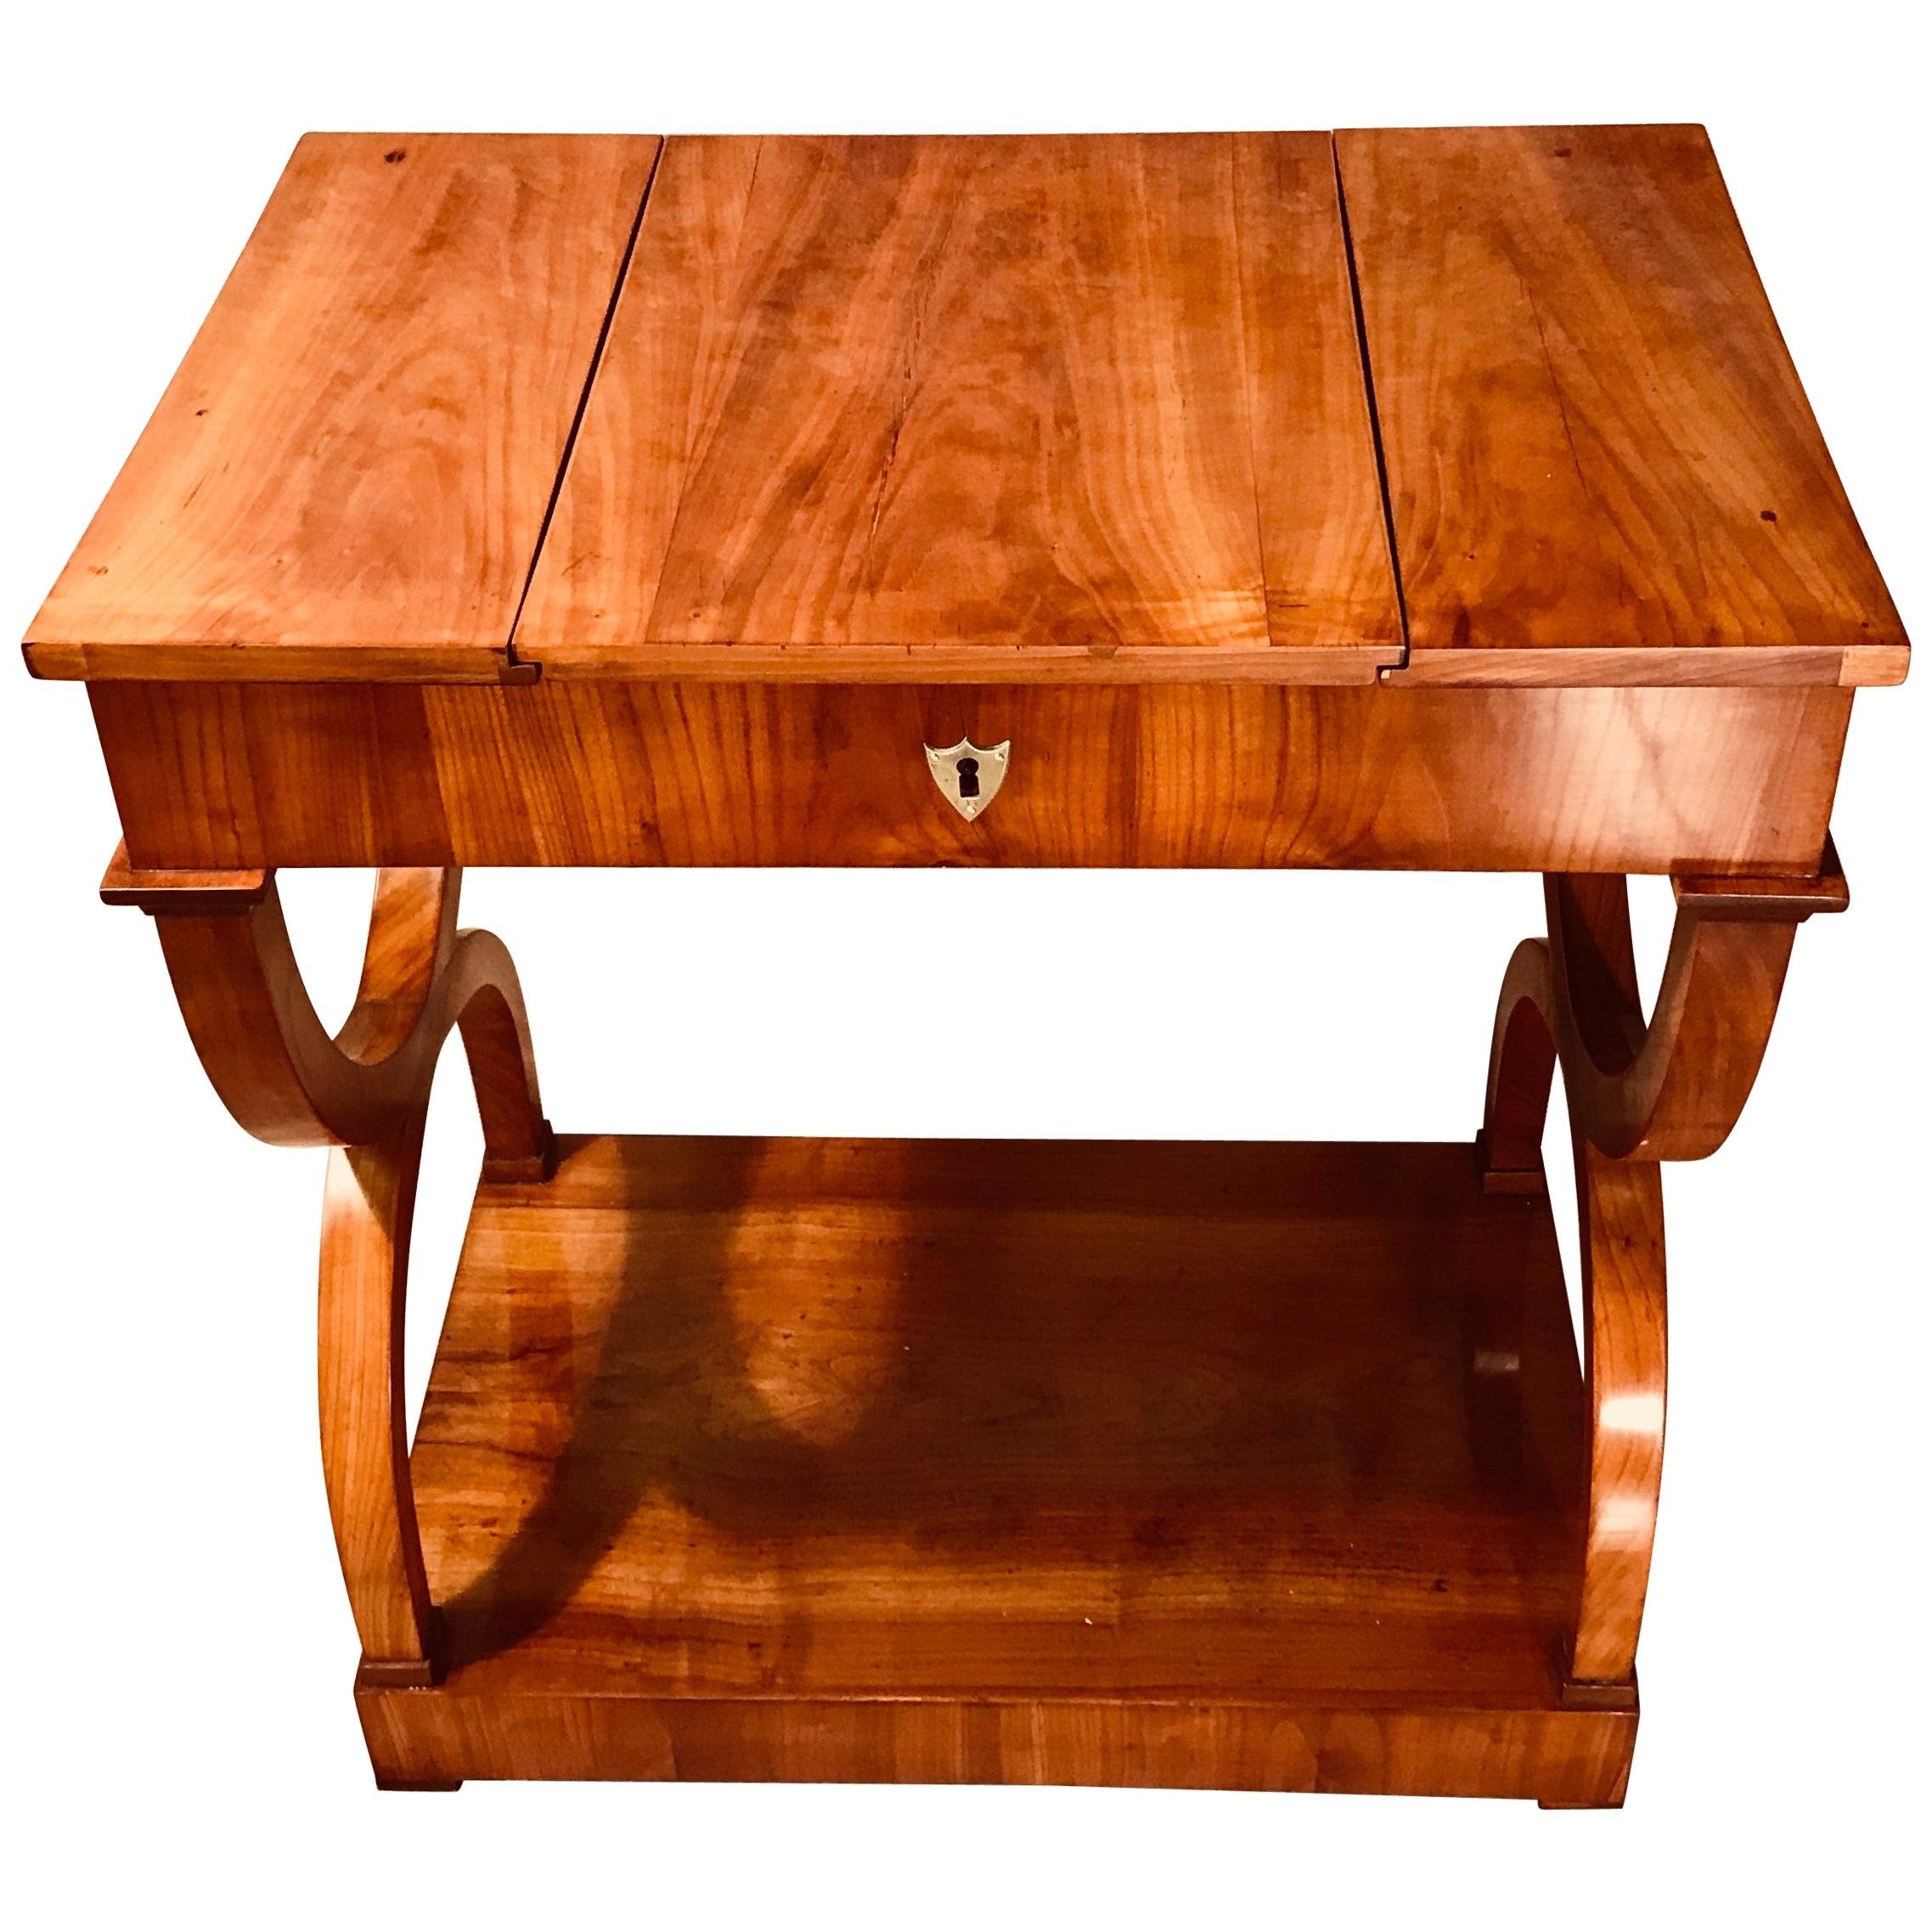 Biedermeier Sewing-or Working Table, Munich, 1810-1820, cherry wood